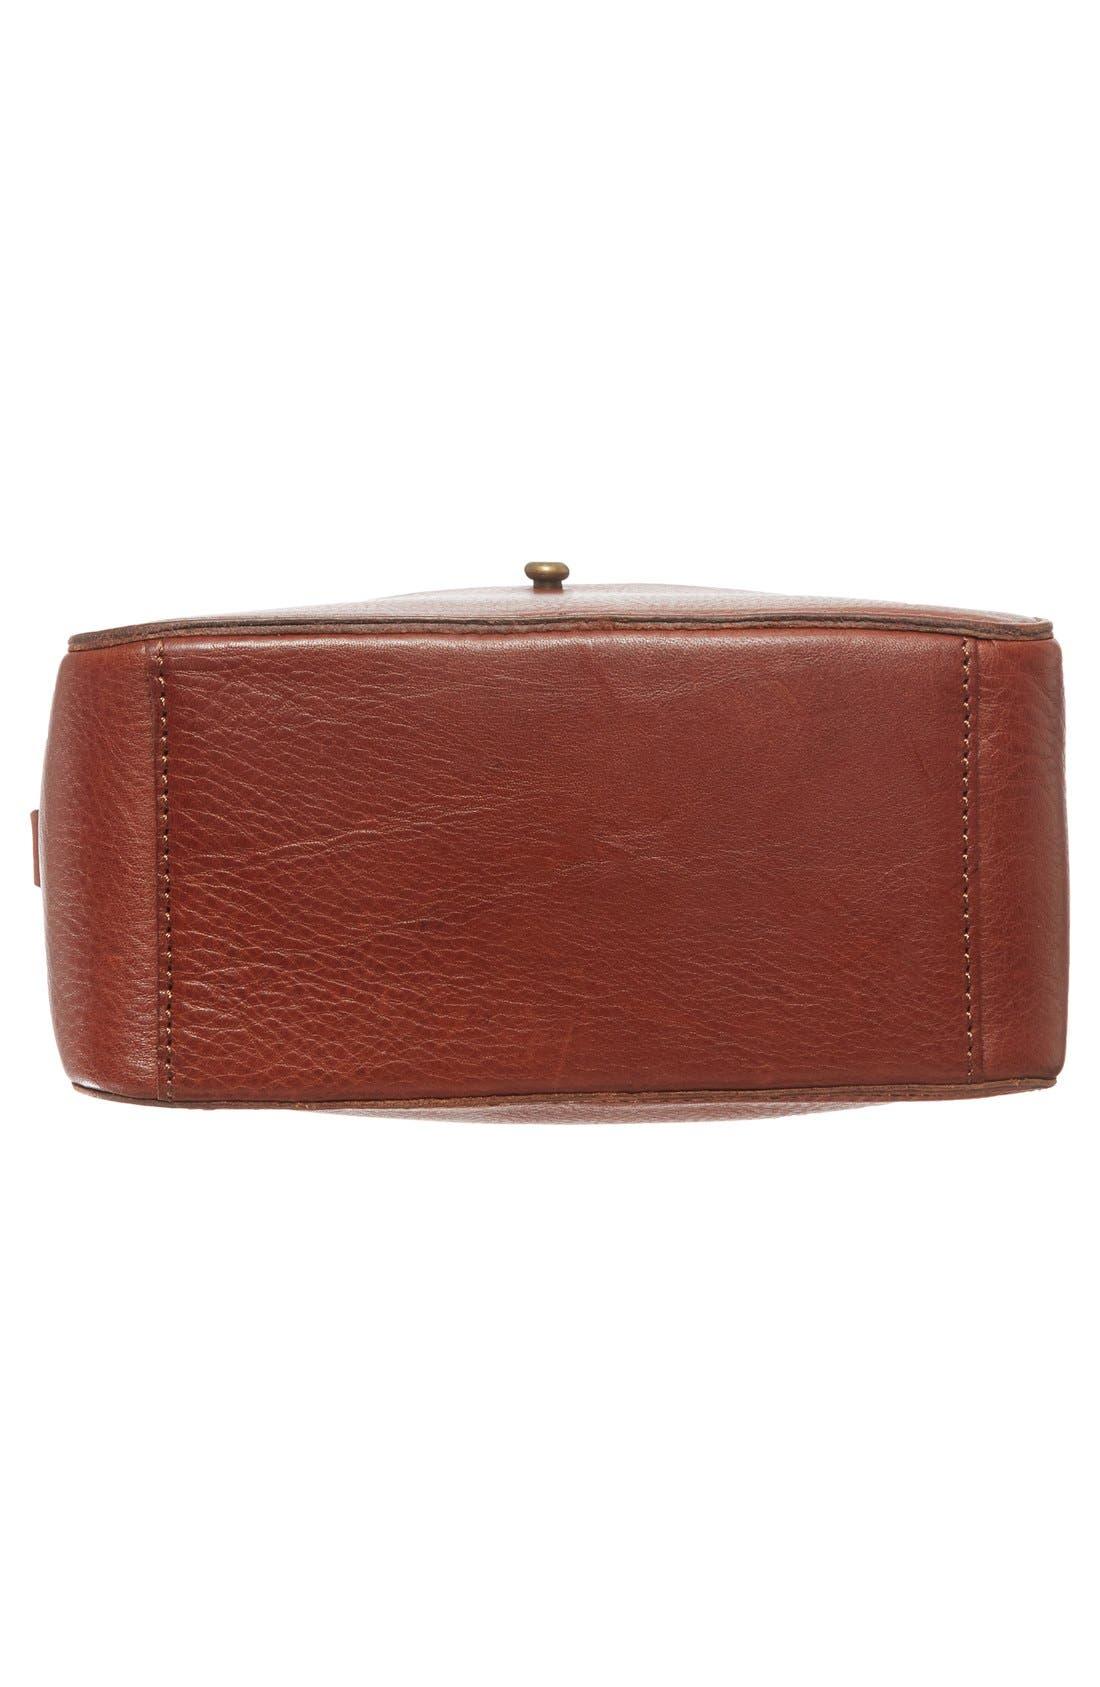 Leather Camera Bag,                             Alternate thumbnail 4, color,                             200